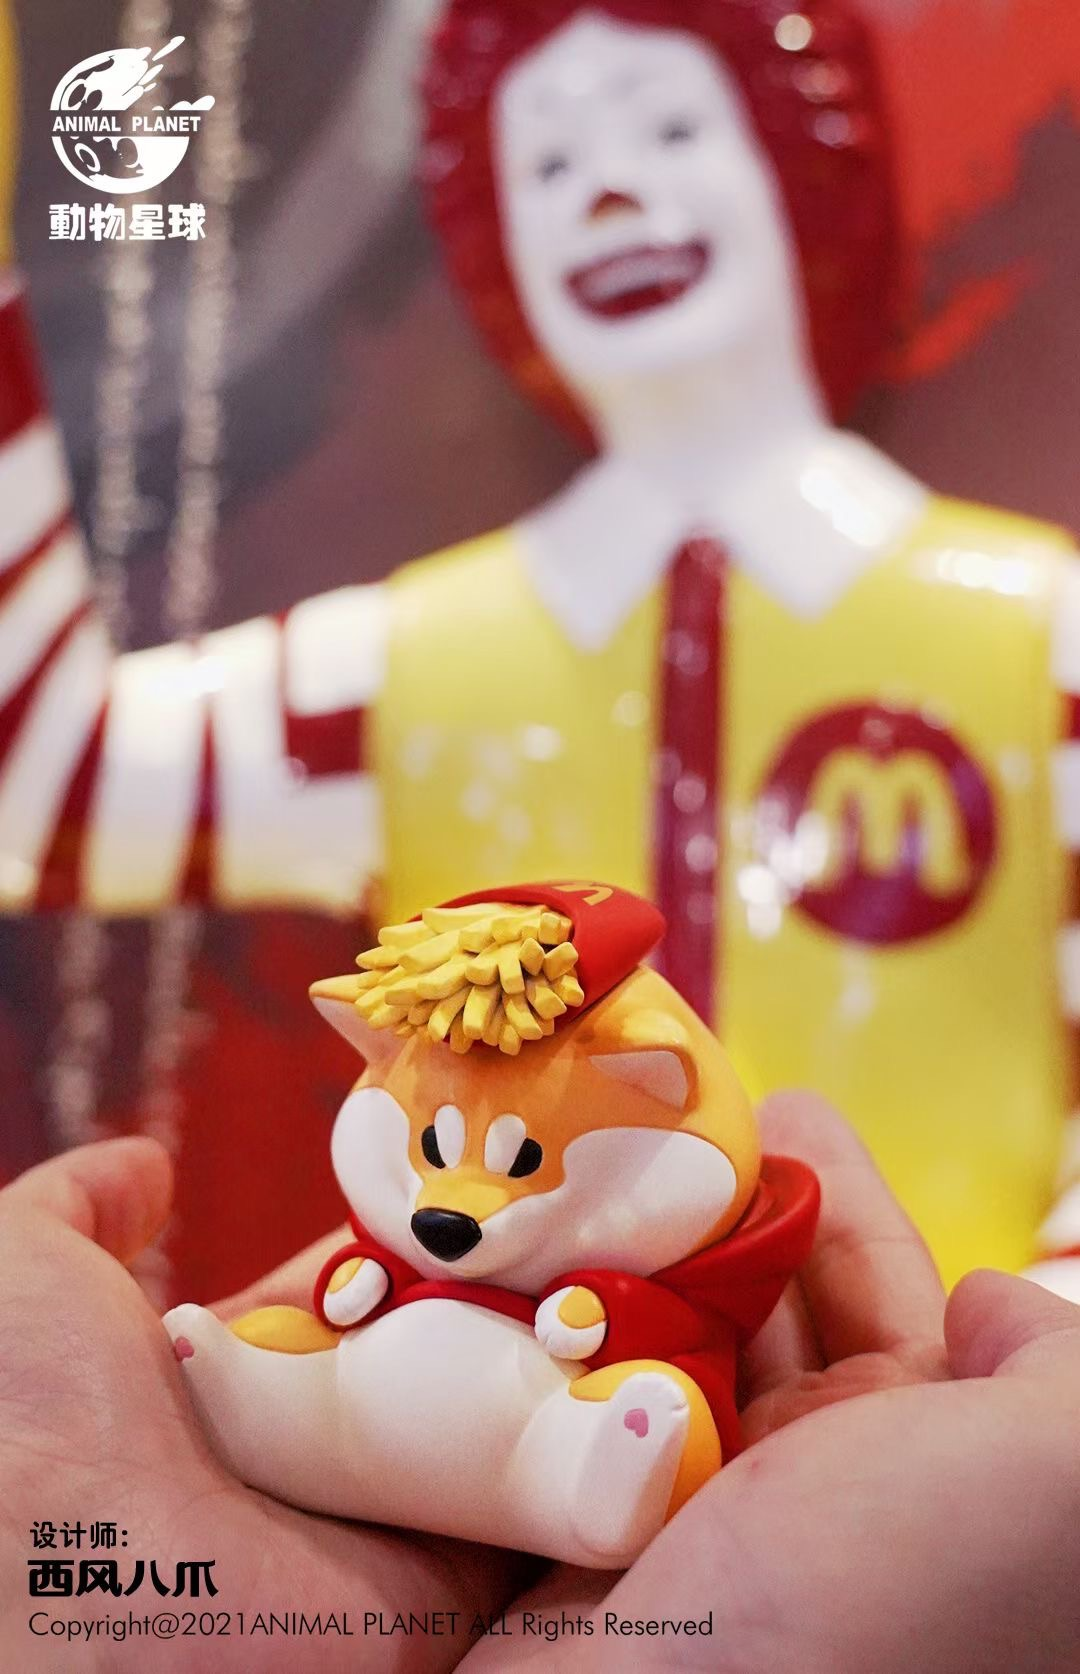 B Shiba x McDonald ชิบะแม็ค Animal Planet (มัดจำ) [[SOLD OUT]]